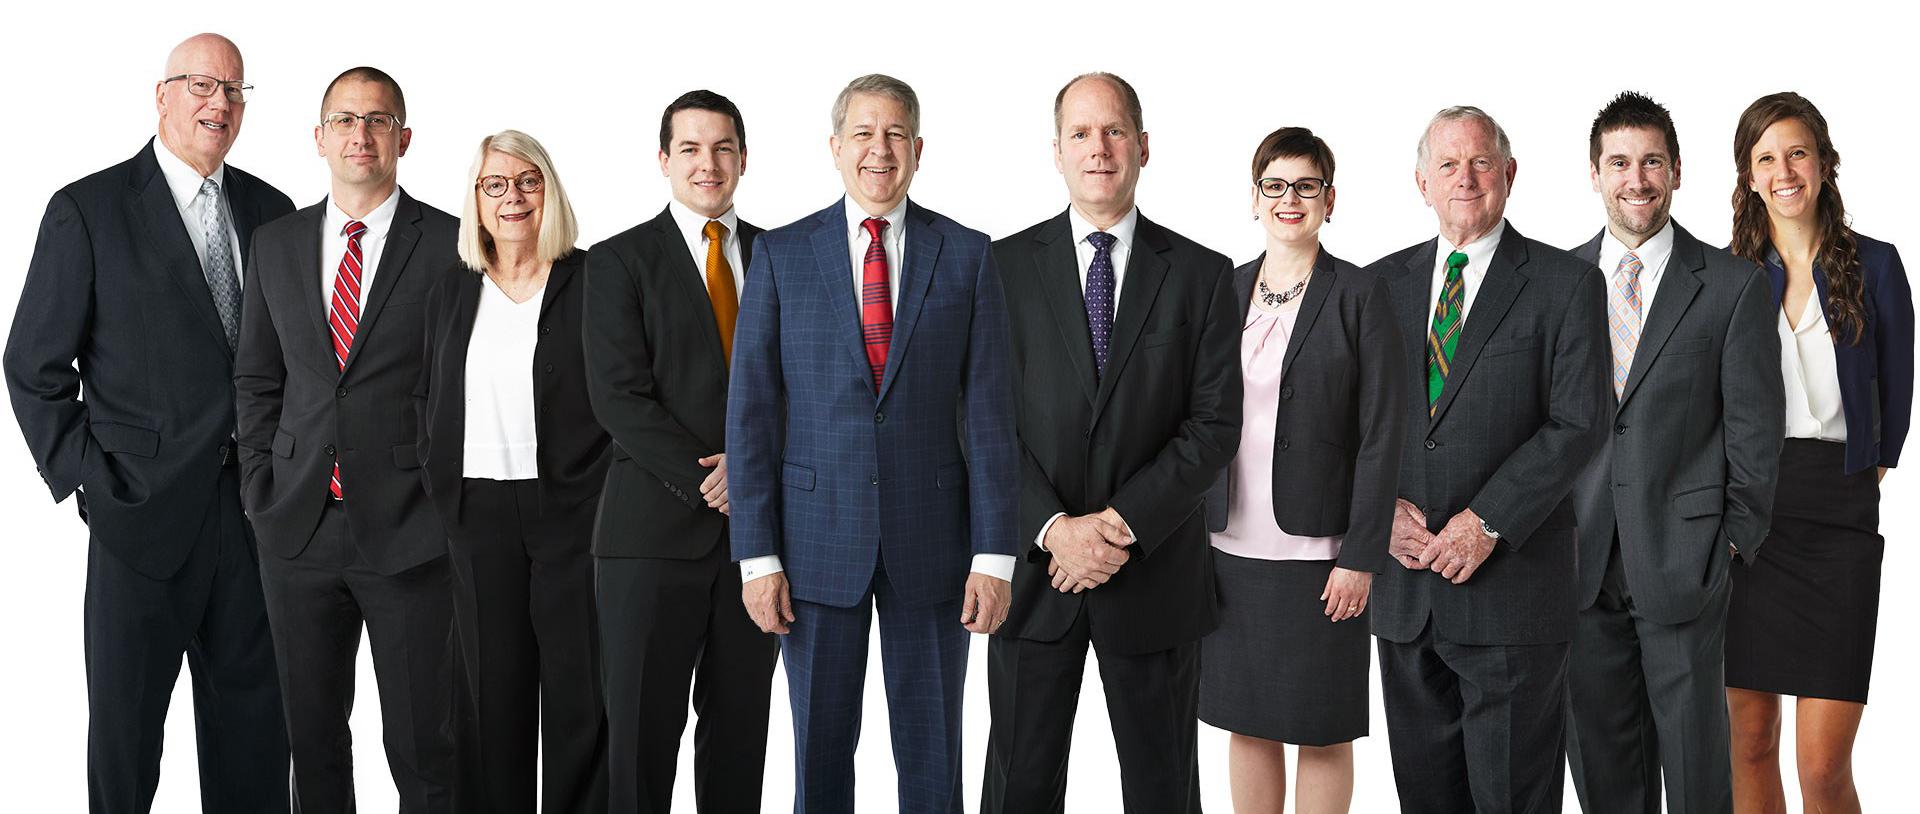 ev-homepage-attorneys-v4-cropped